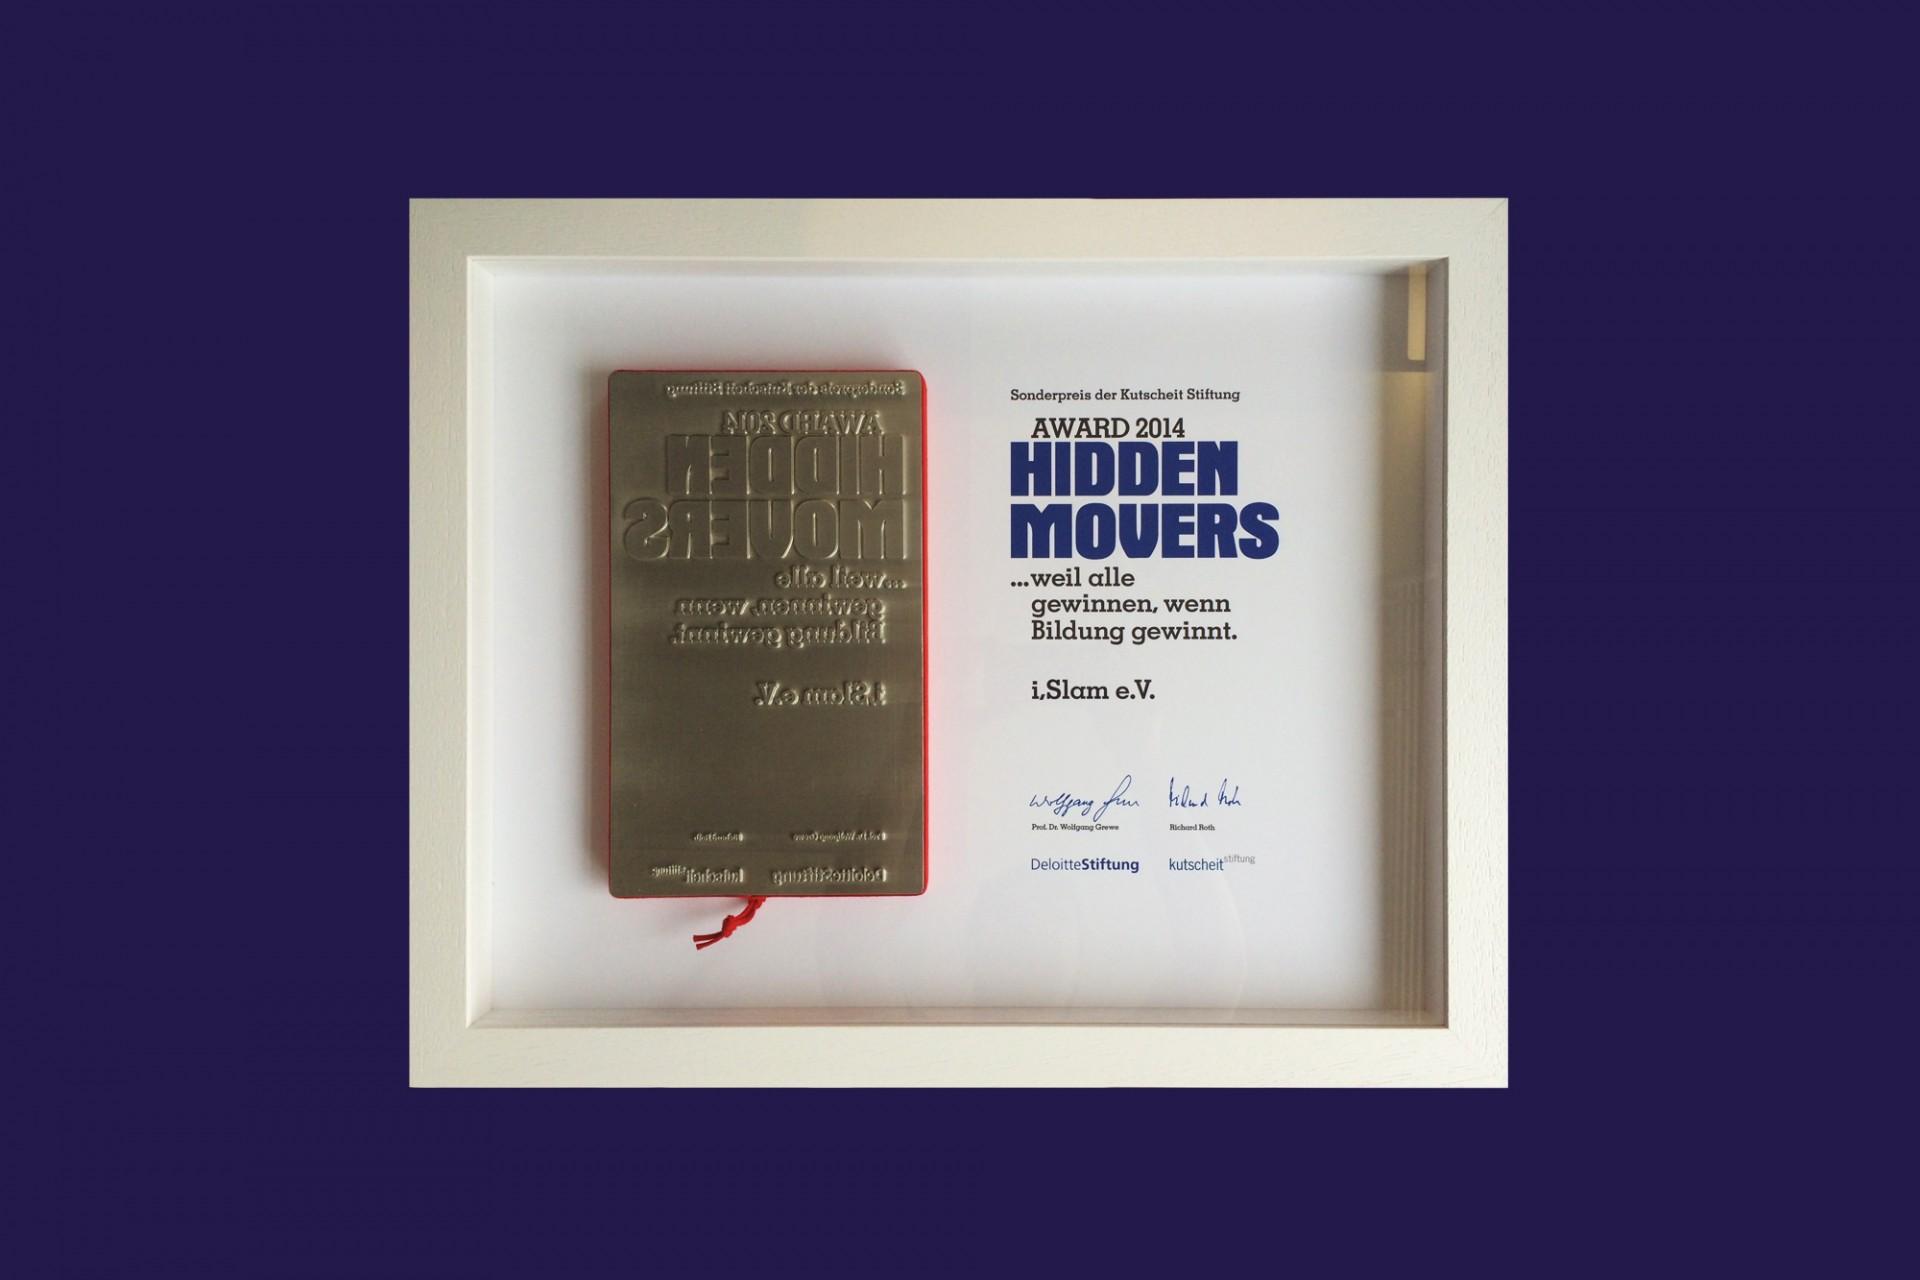 Gestaltanstalt Hidden Movers Award